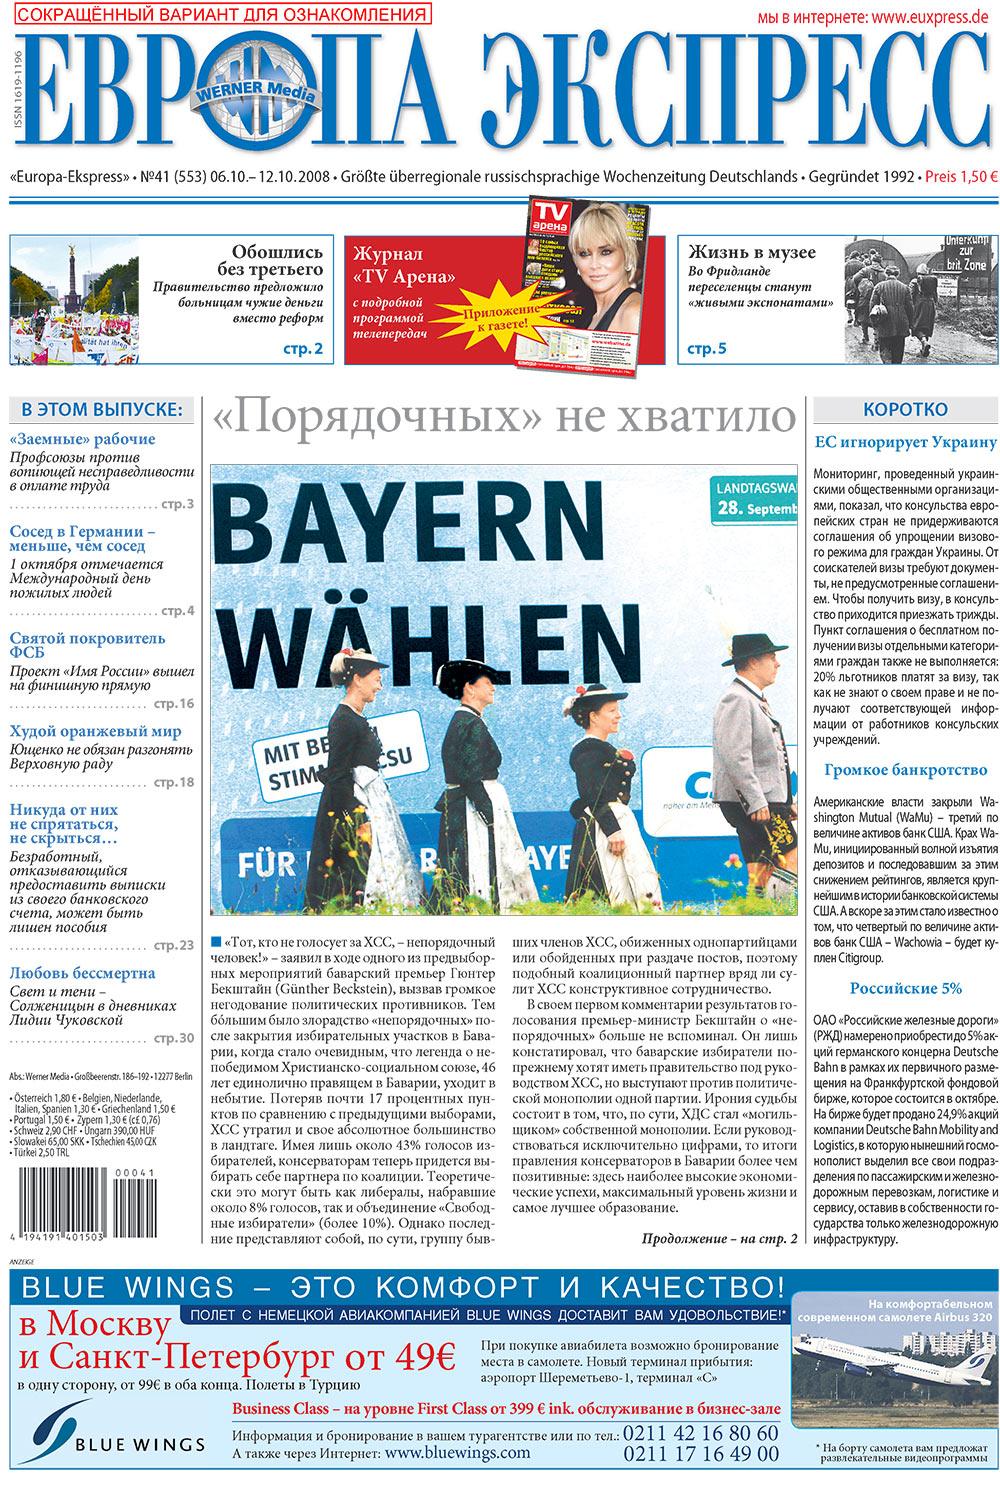 Европа экспресс (газета). 2008 год, номер 41, стр. 1